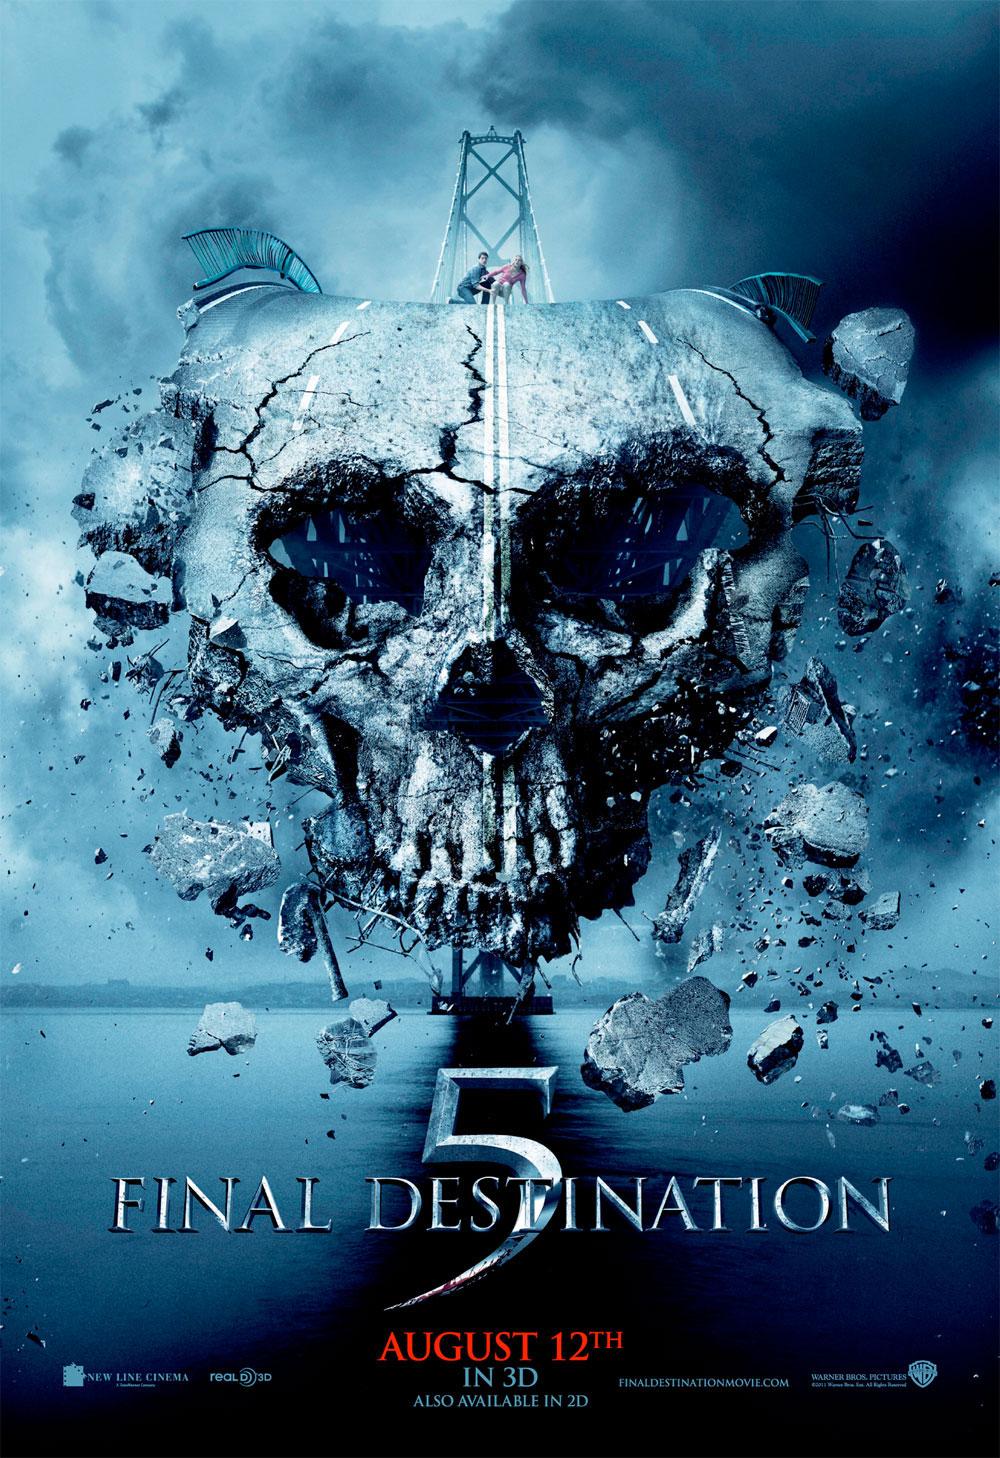 8018 - Final Destination 5 - Lưỡi Hái Tử Thần 5